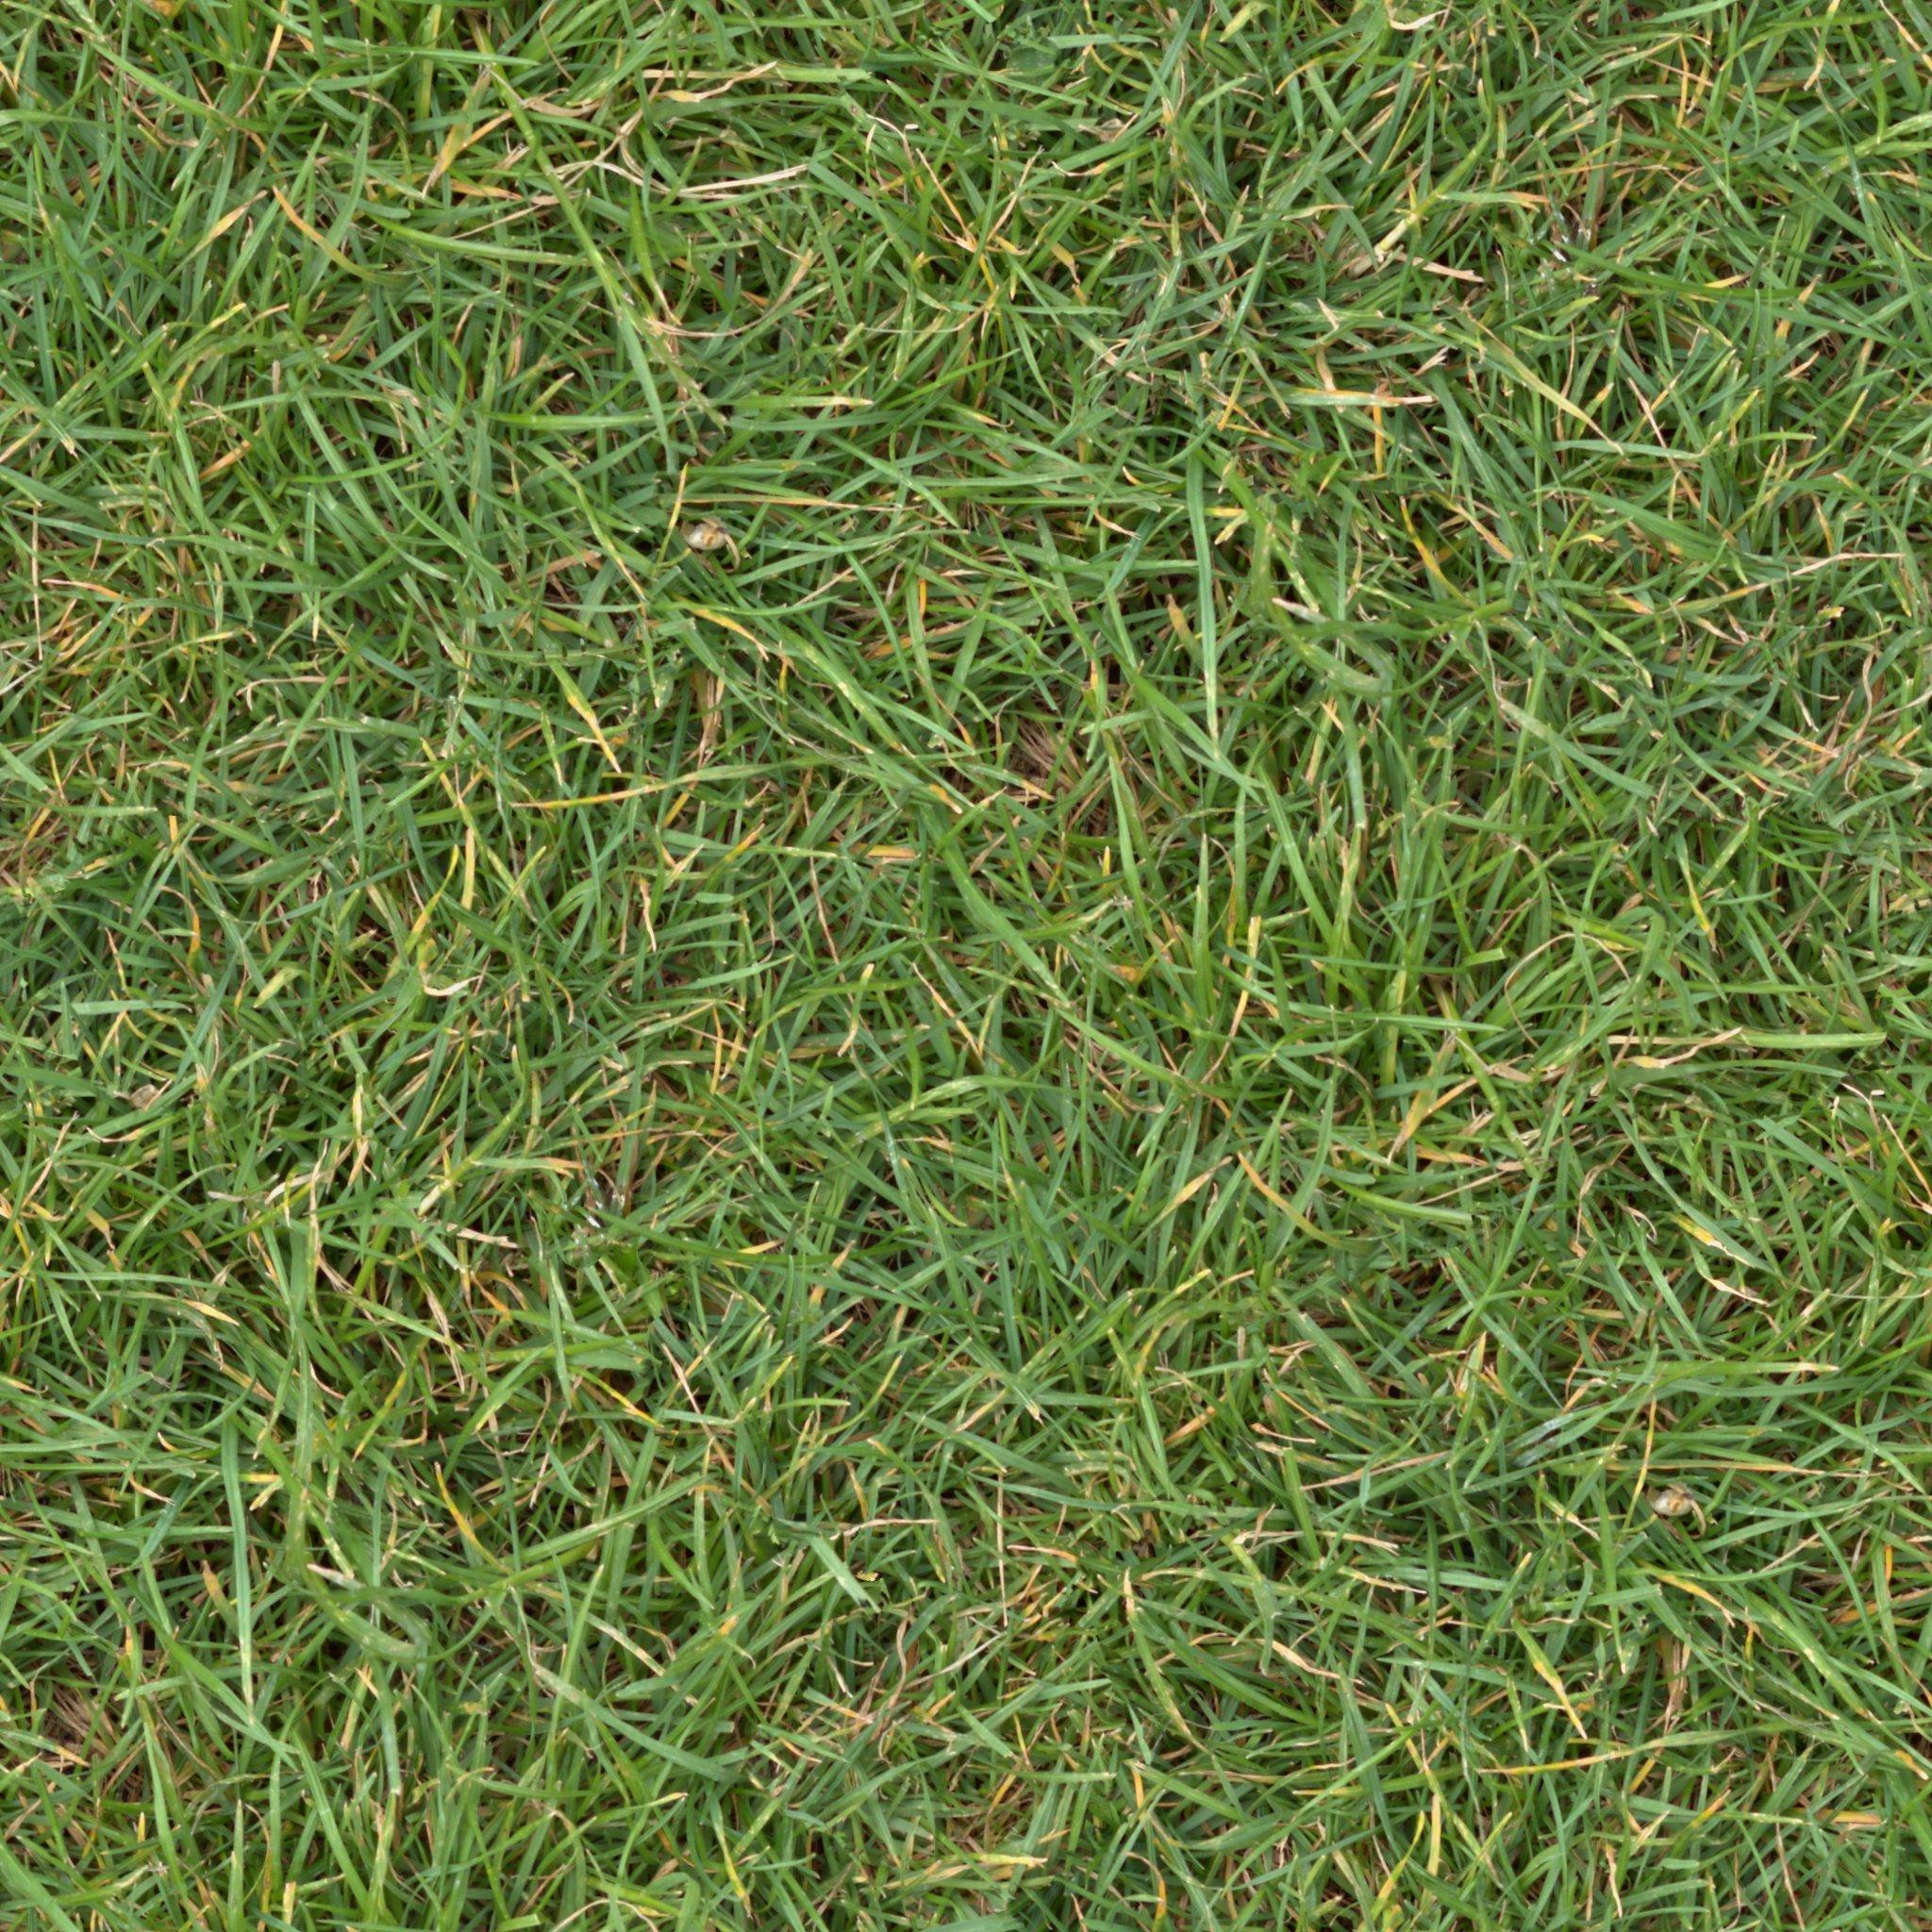 Grass Texture Tileable 2048x2048 ~ Textures ~ Creative Market